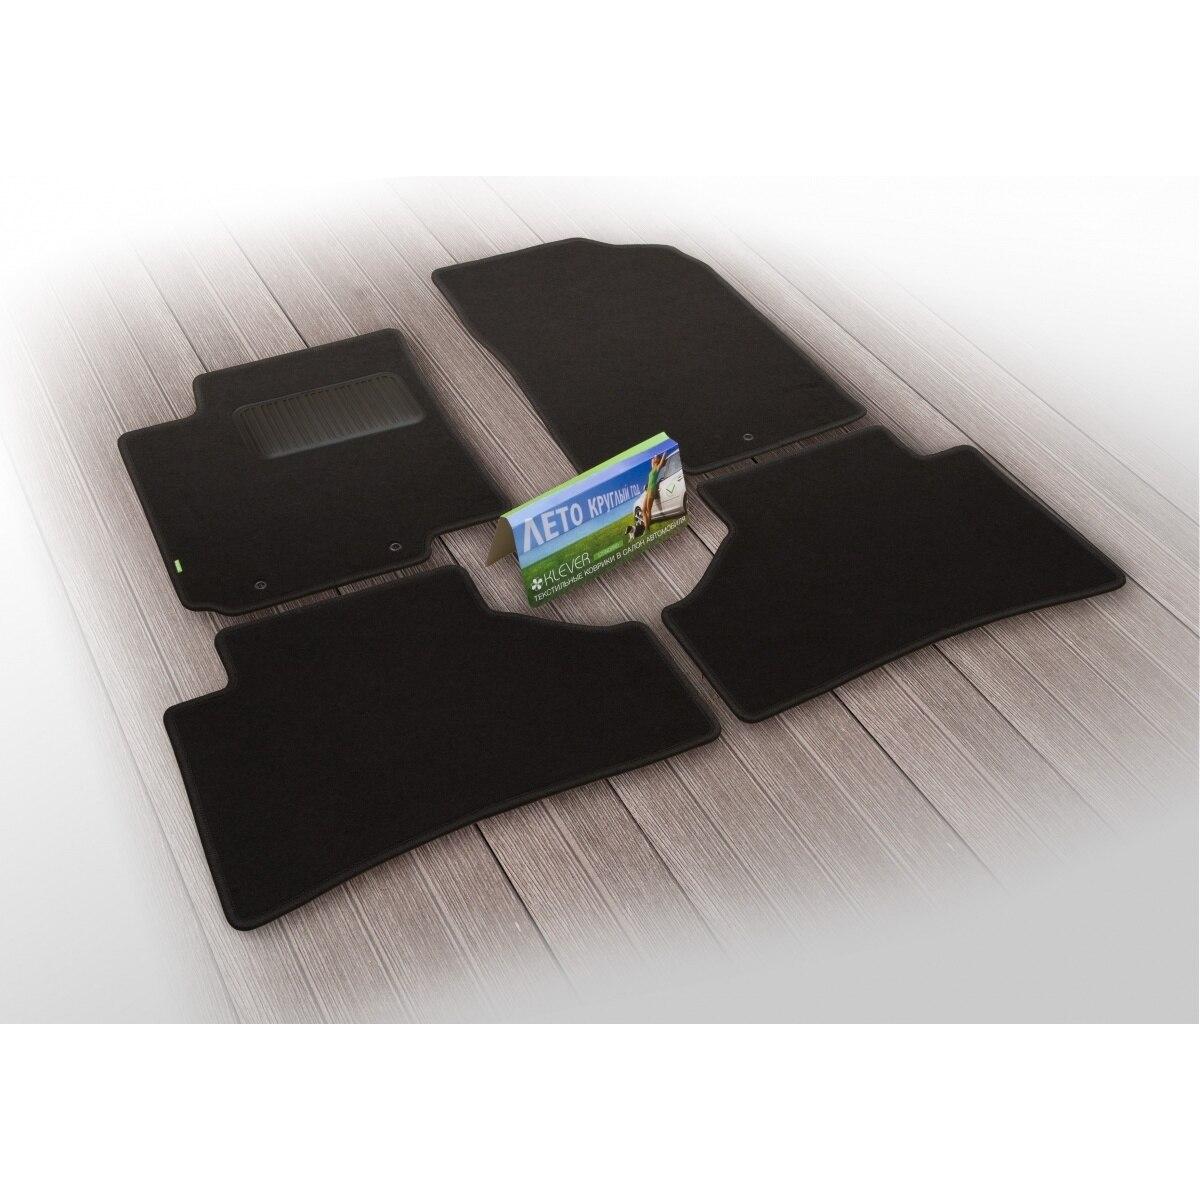 Floor mats Klever standard Mitsubishi Outlander III automatic transmission 2012 & gt Floor Mats Automobiles & Motorcycles - title=